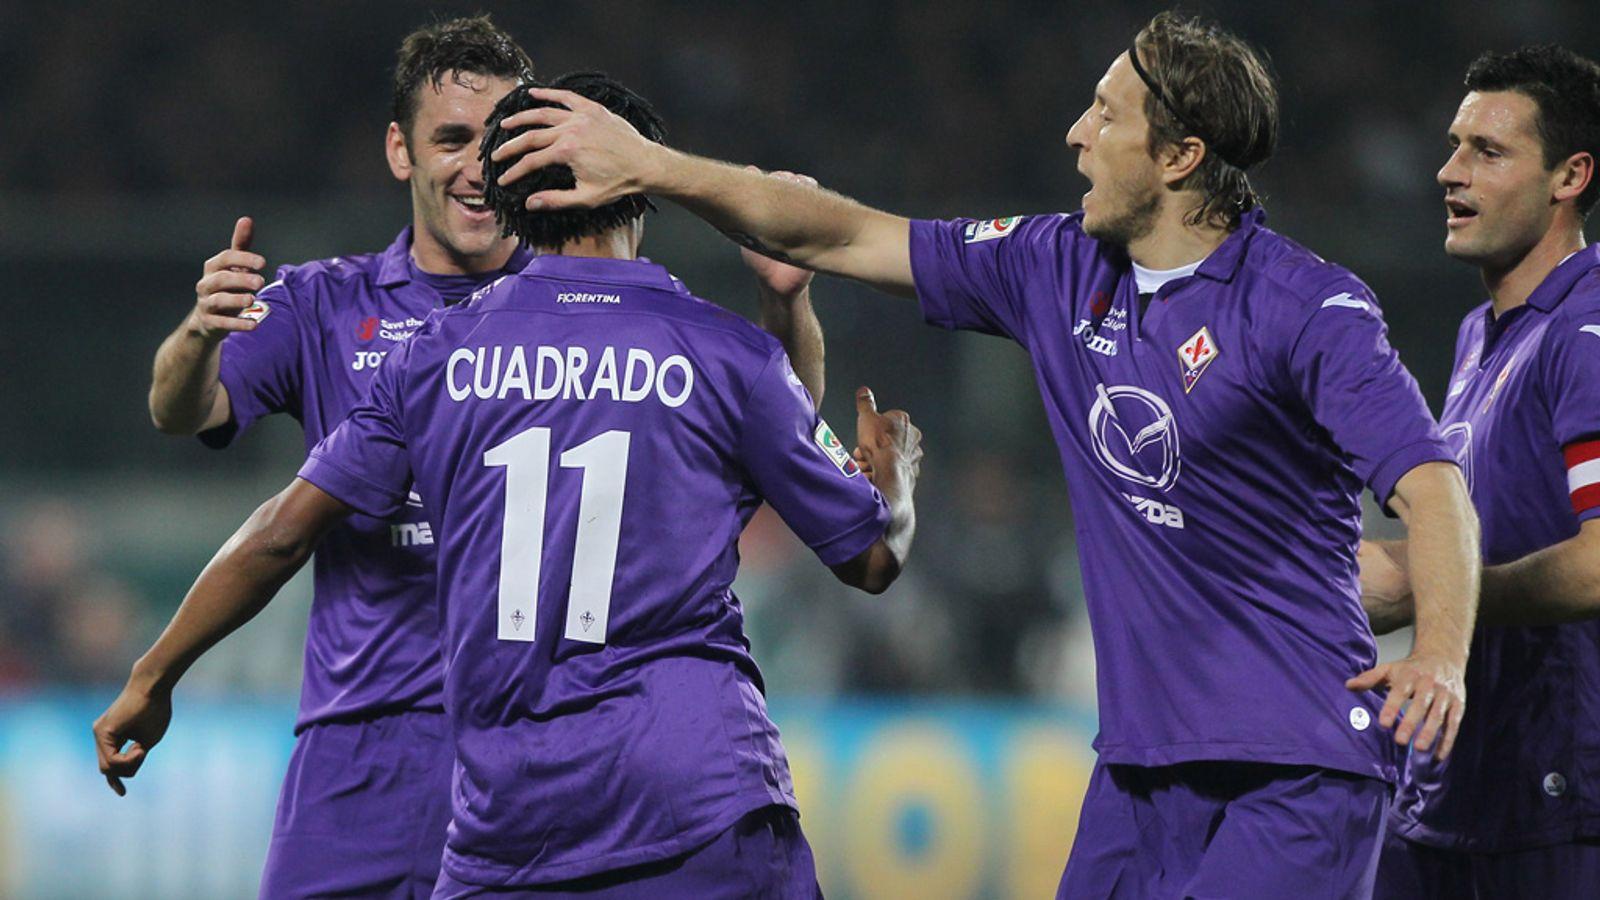 Fiorentina 3 - 1 Chievo - Match Report & Highlights